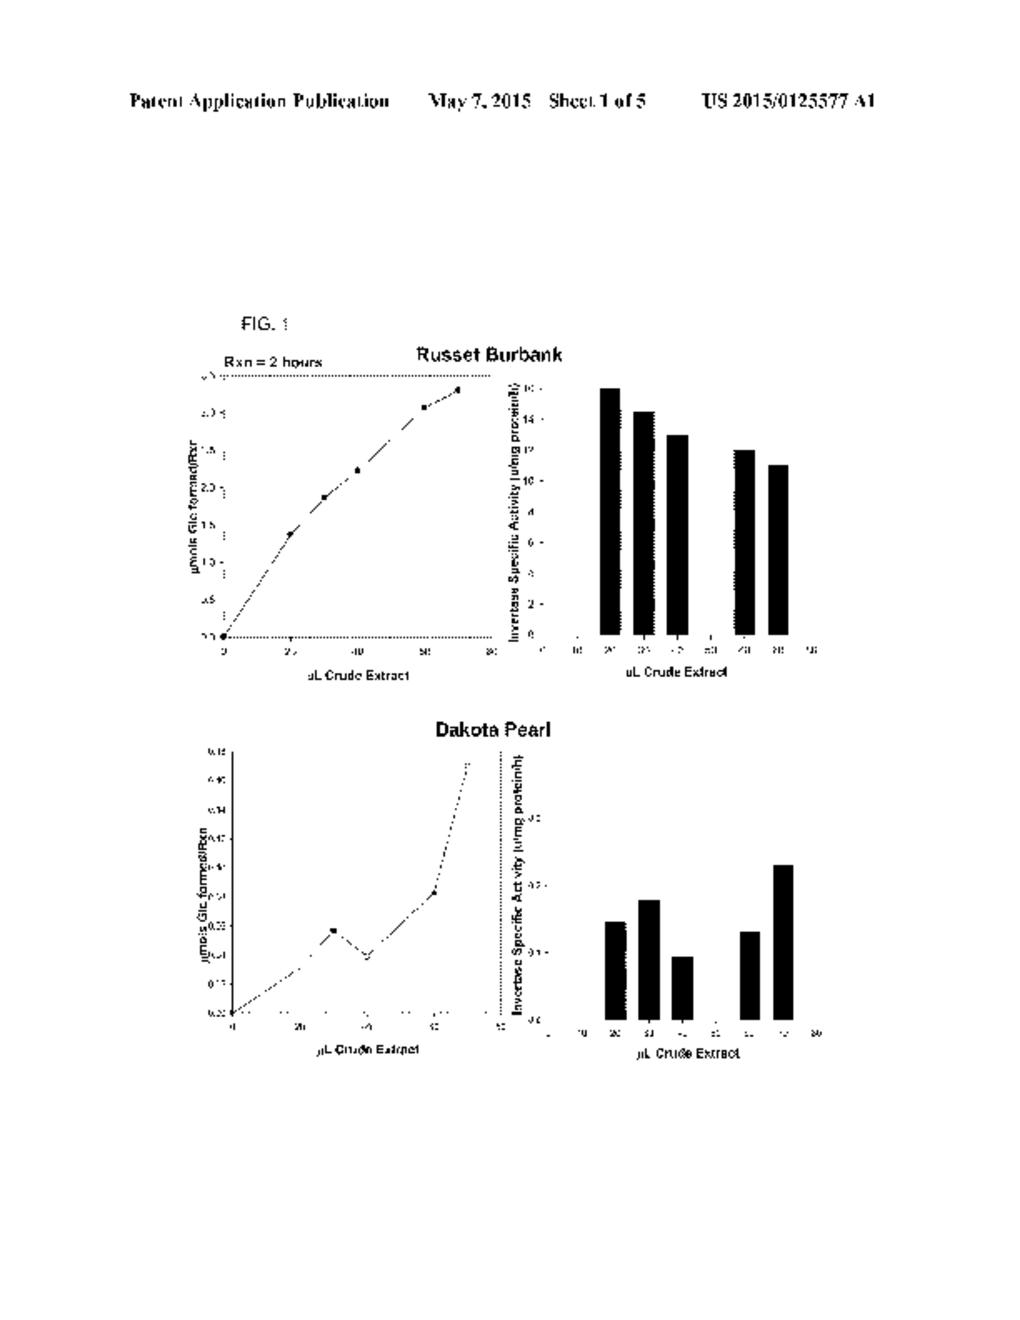 20150125577_02 tuber storage test methods diagram, schematic, and image 02